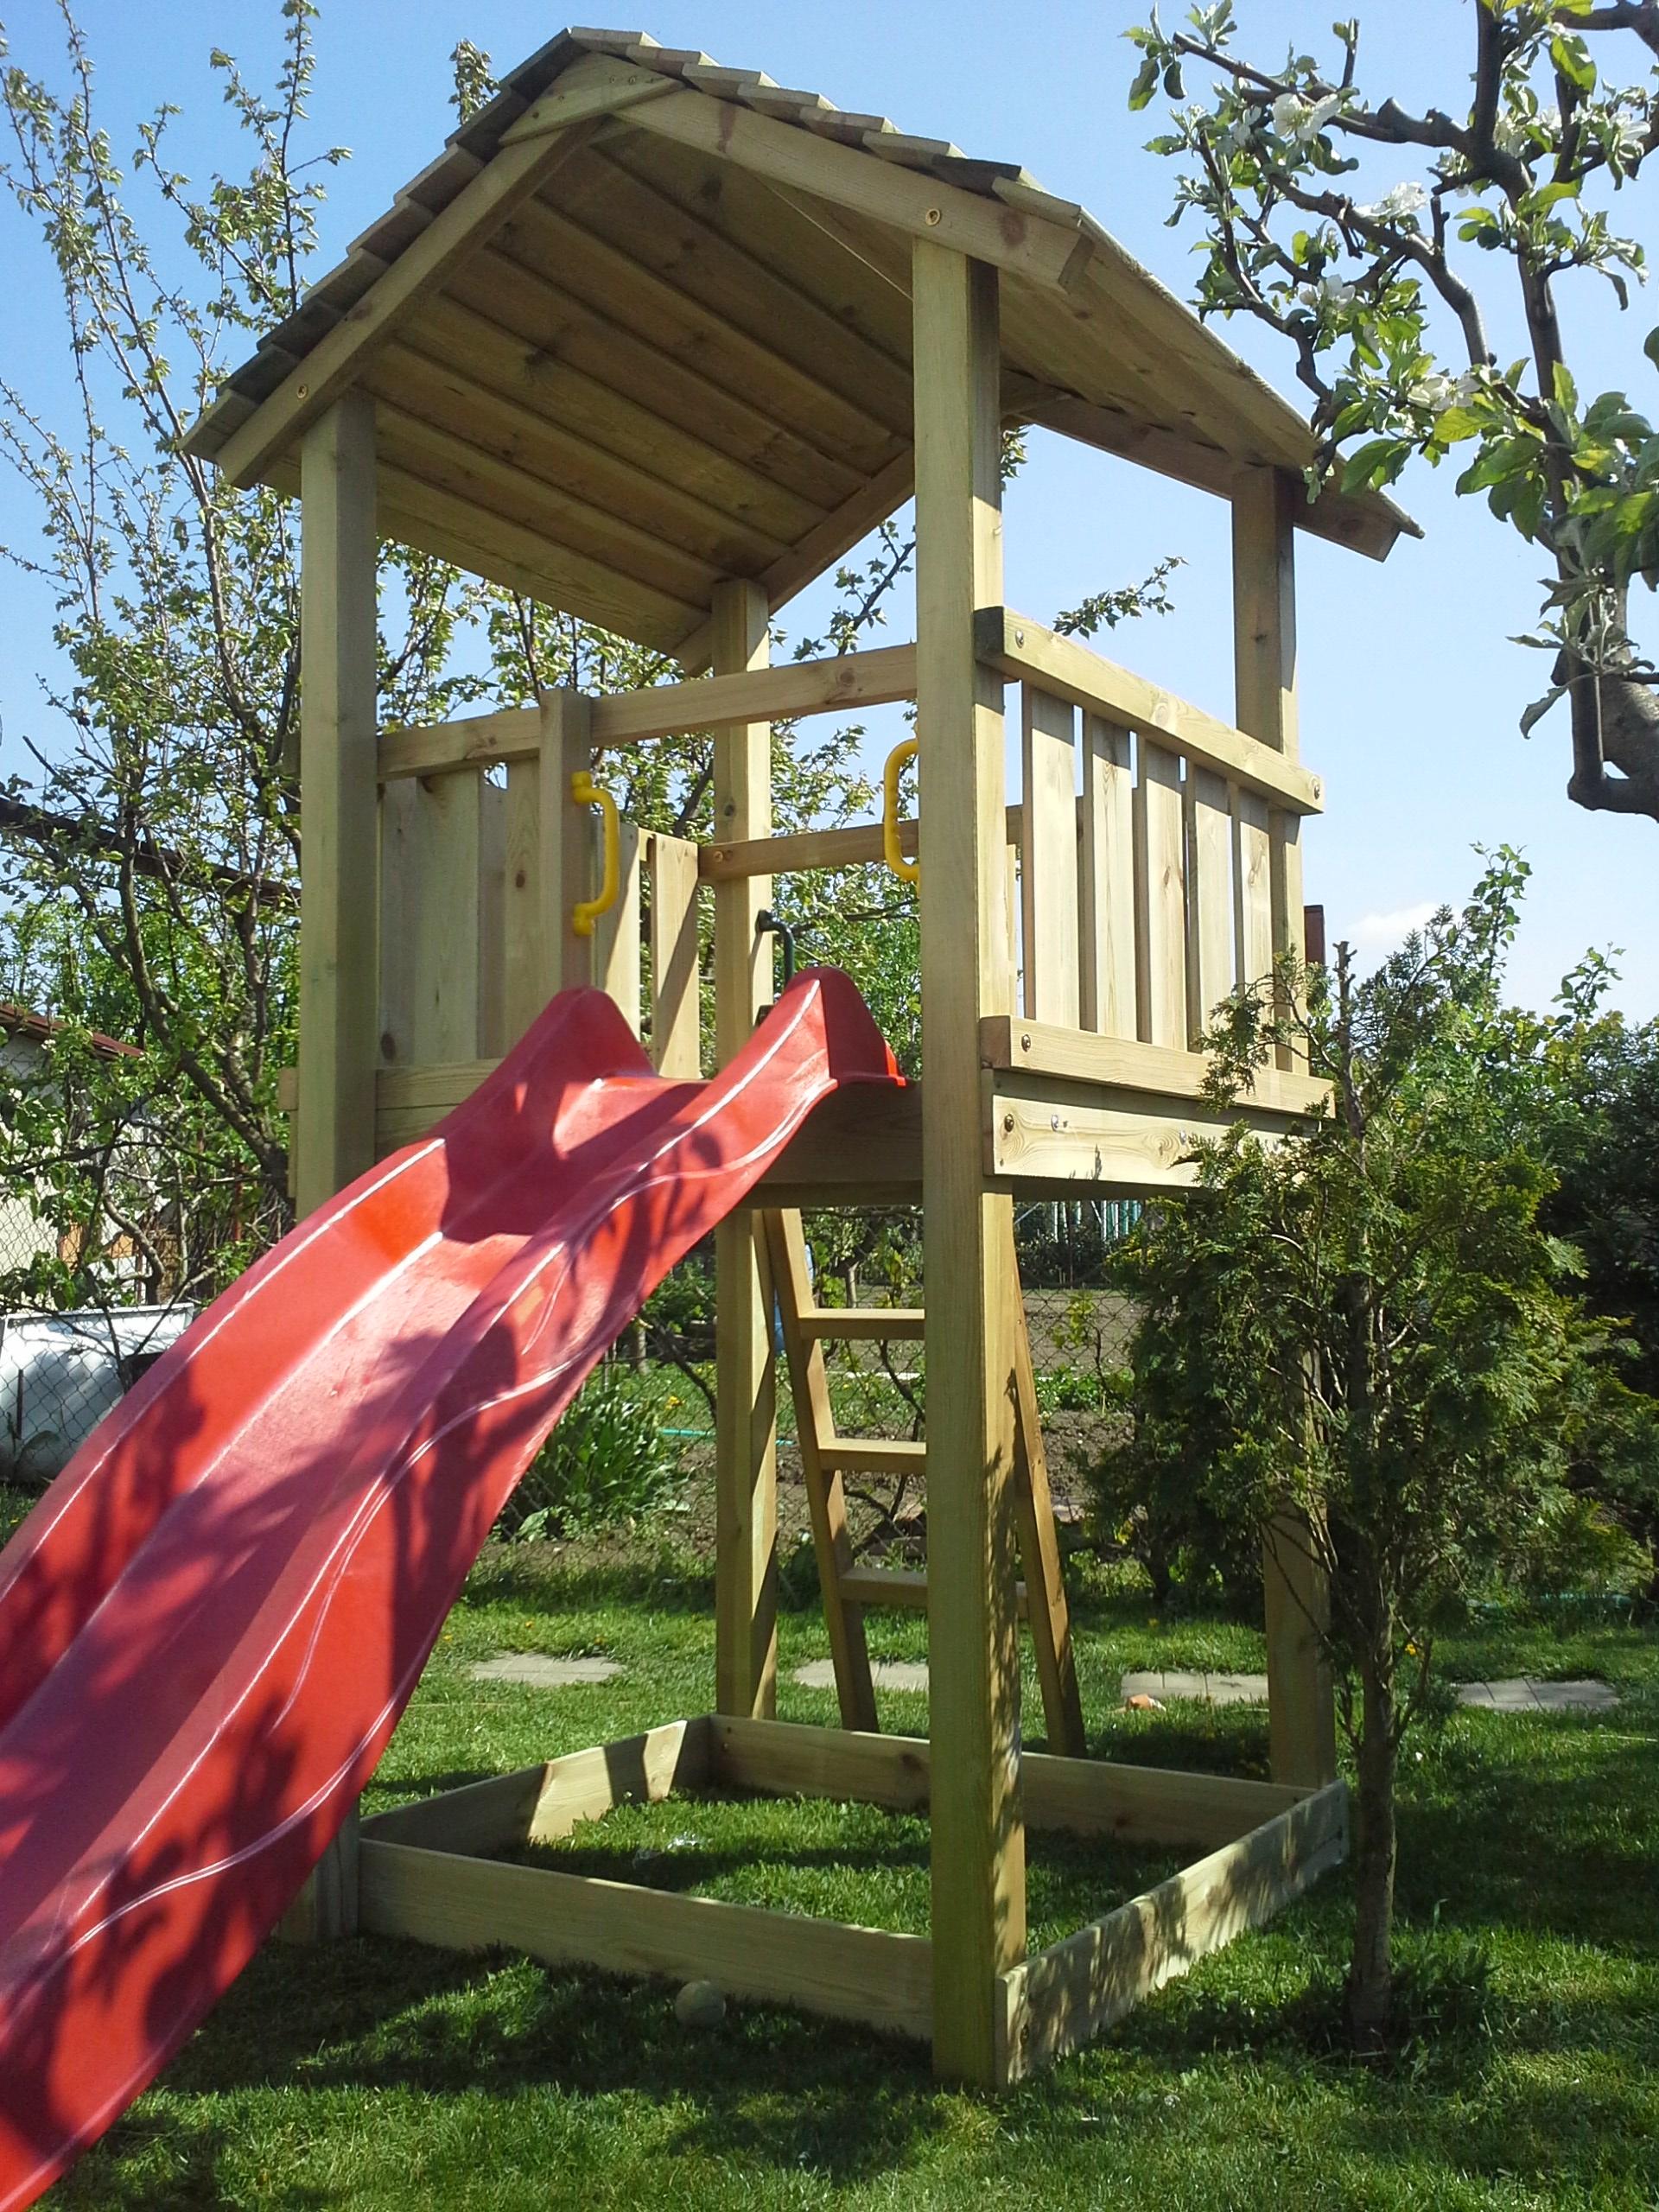 a26abe661ce55 Detský drevený domček Veža 2, šmýkačka, pieskovisko | Drevené detské ...